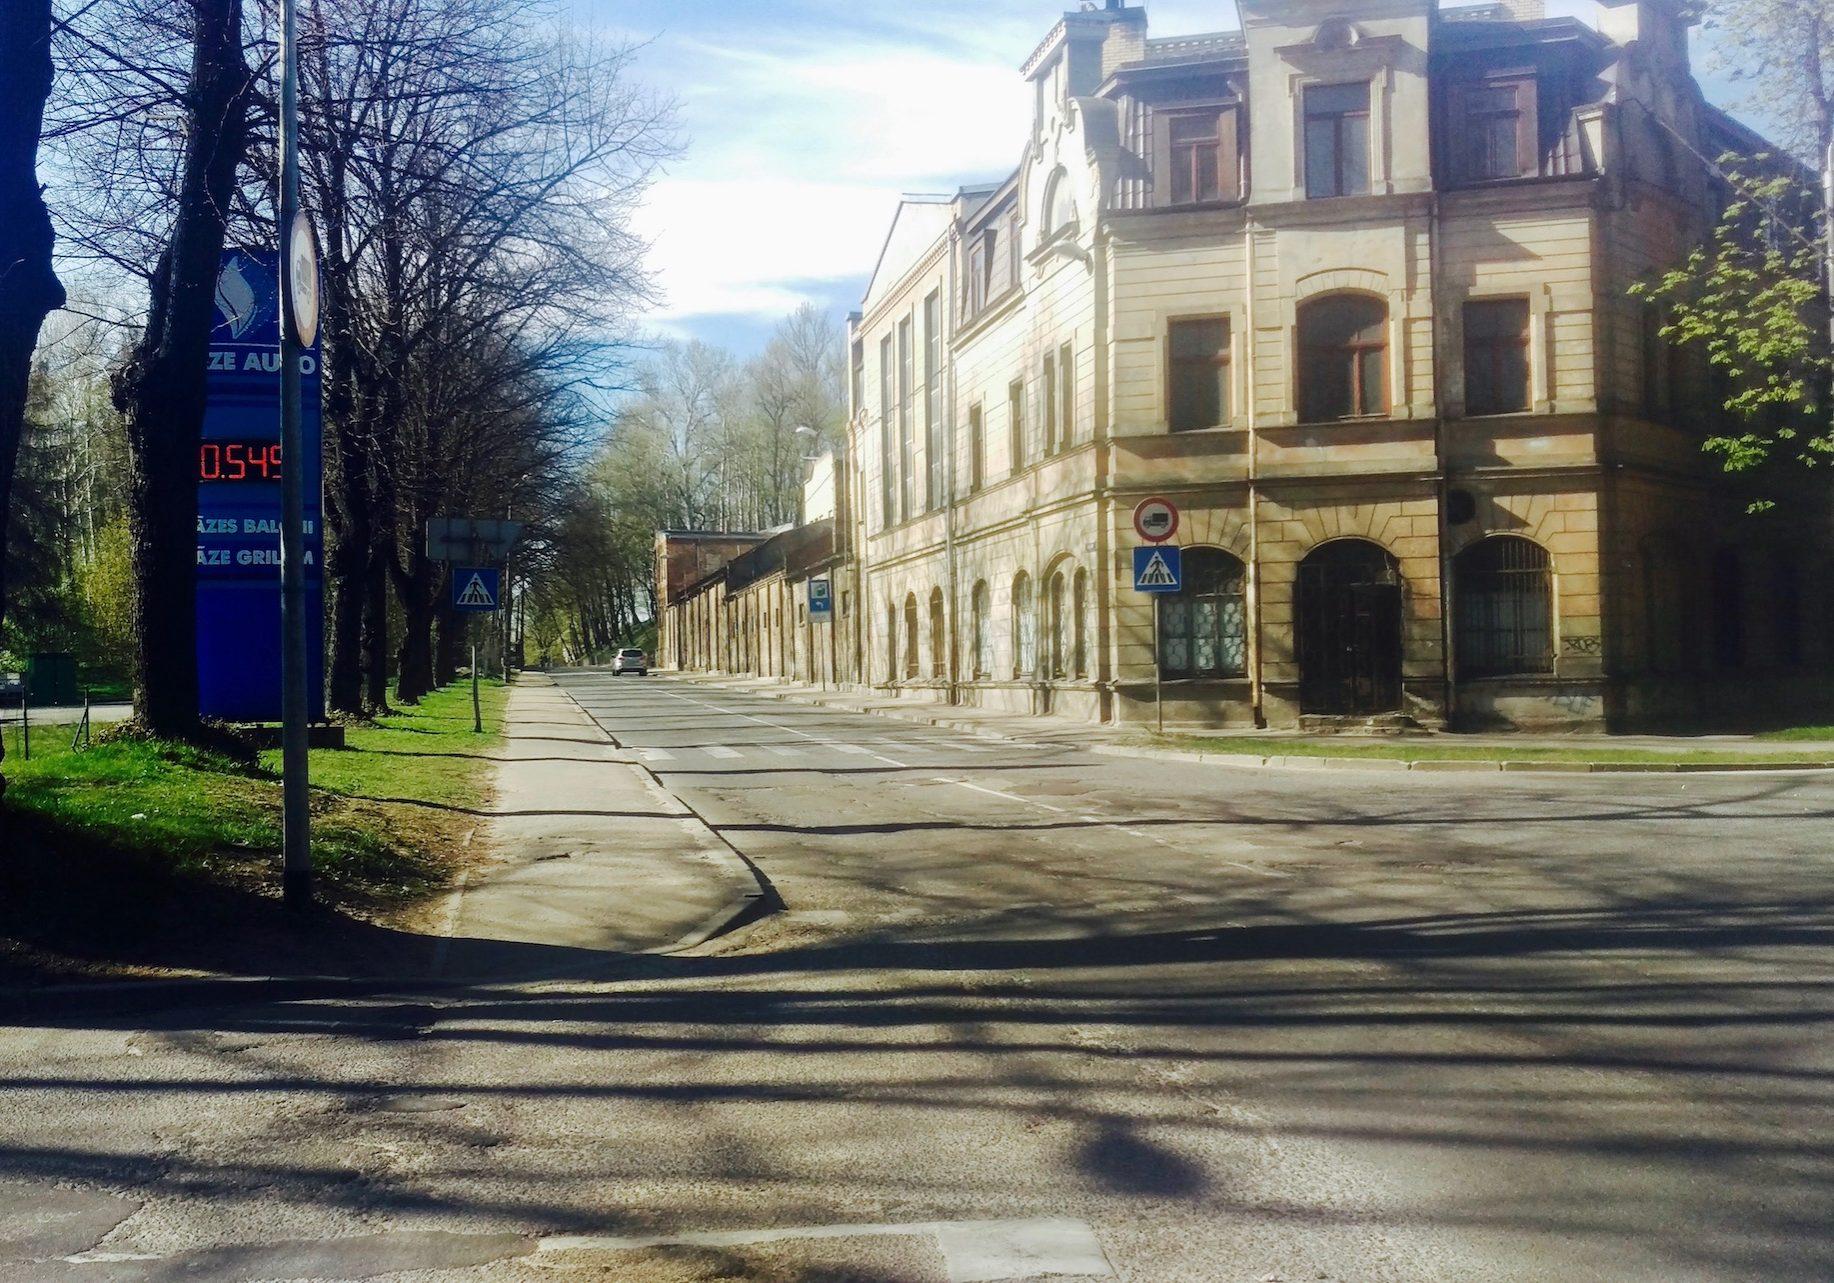 Buļļu street